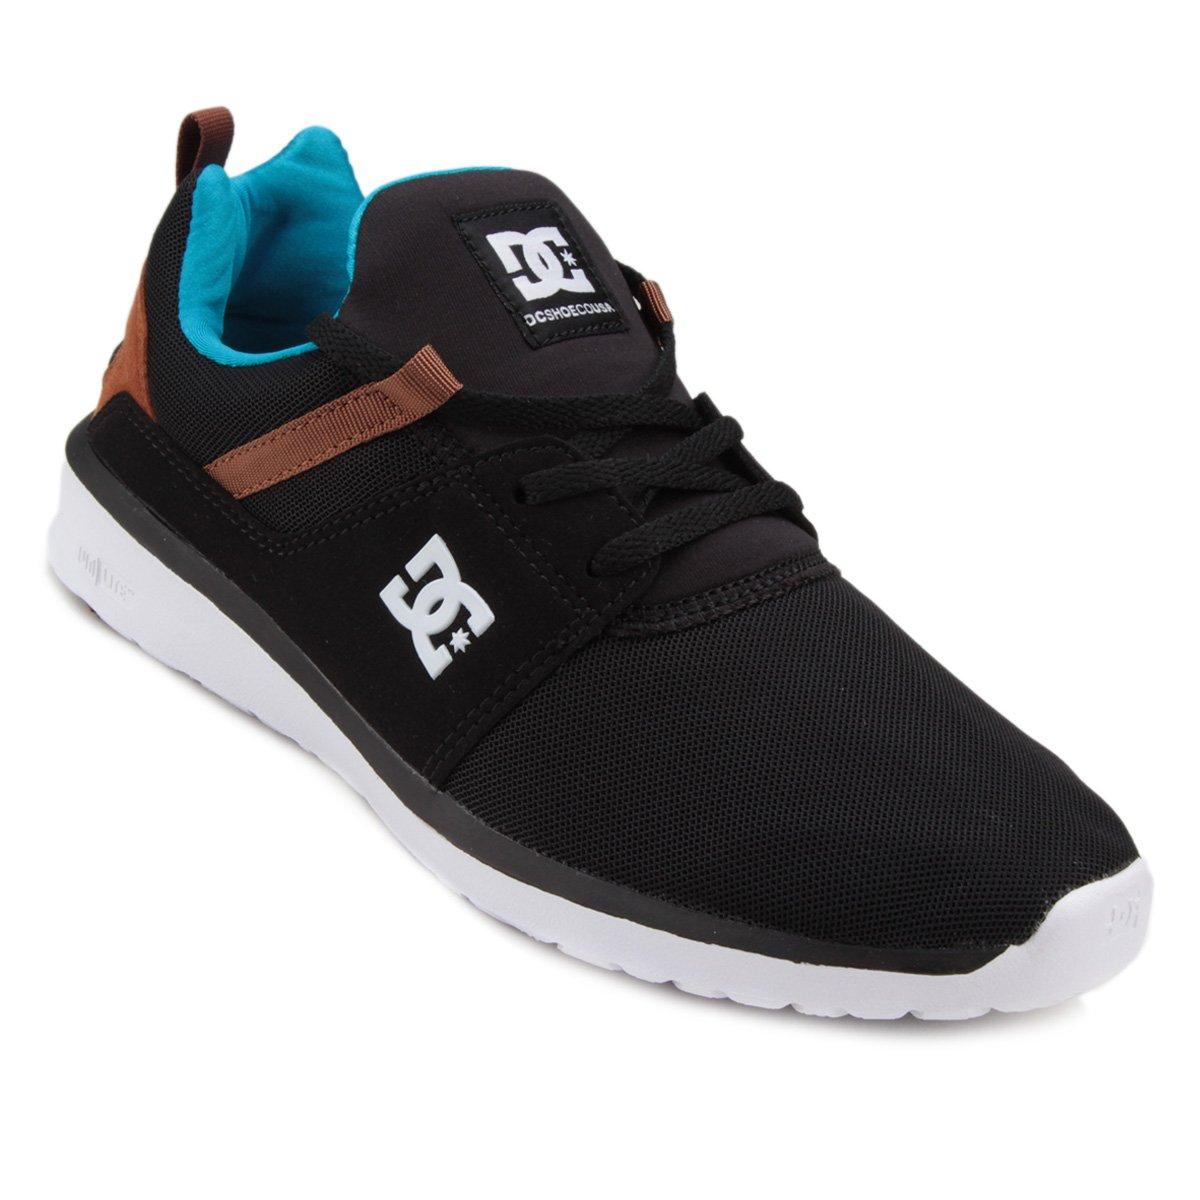 f29a8c9e1 Tênis DC Shoes Heathrow Masculino - Branco e Preto | Allianz Parque Shop